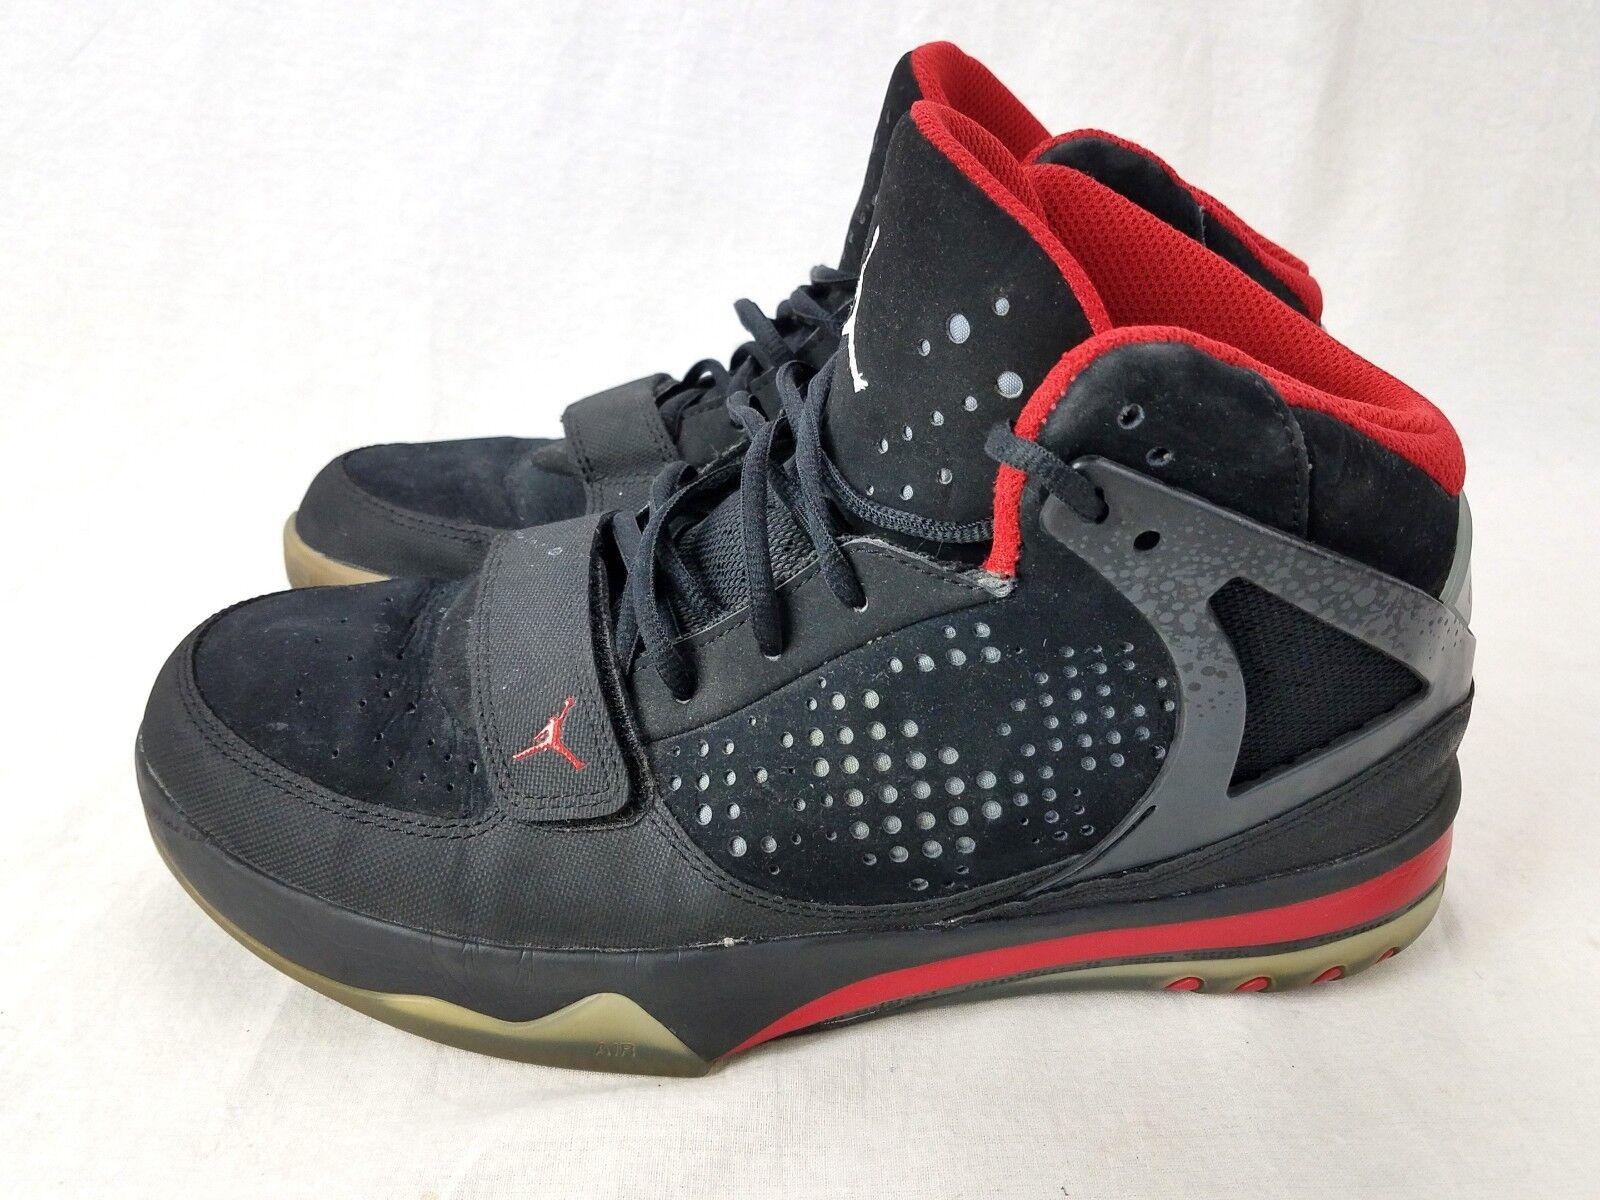 purchase cheap 3f8af b8616 ... discount nike jordan phase 23 basketball schwarz 440897 003 uni rote  stealth 440897 f7f9b 5572a